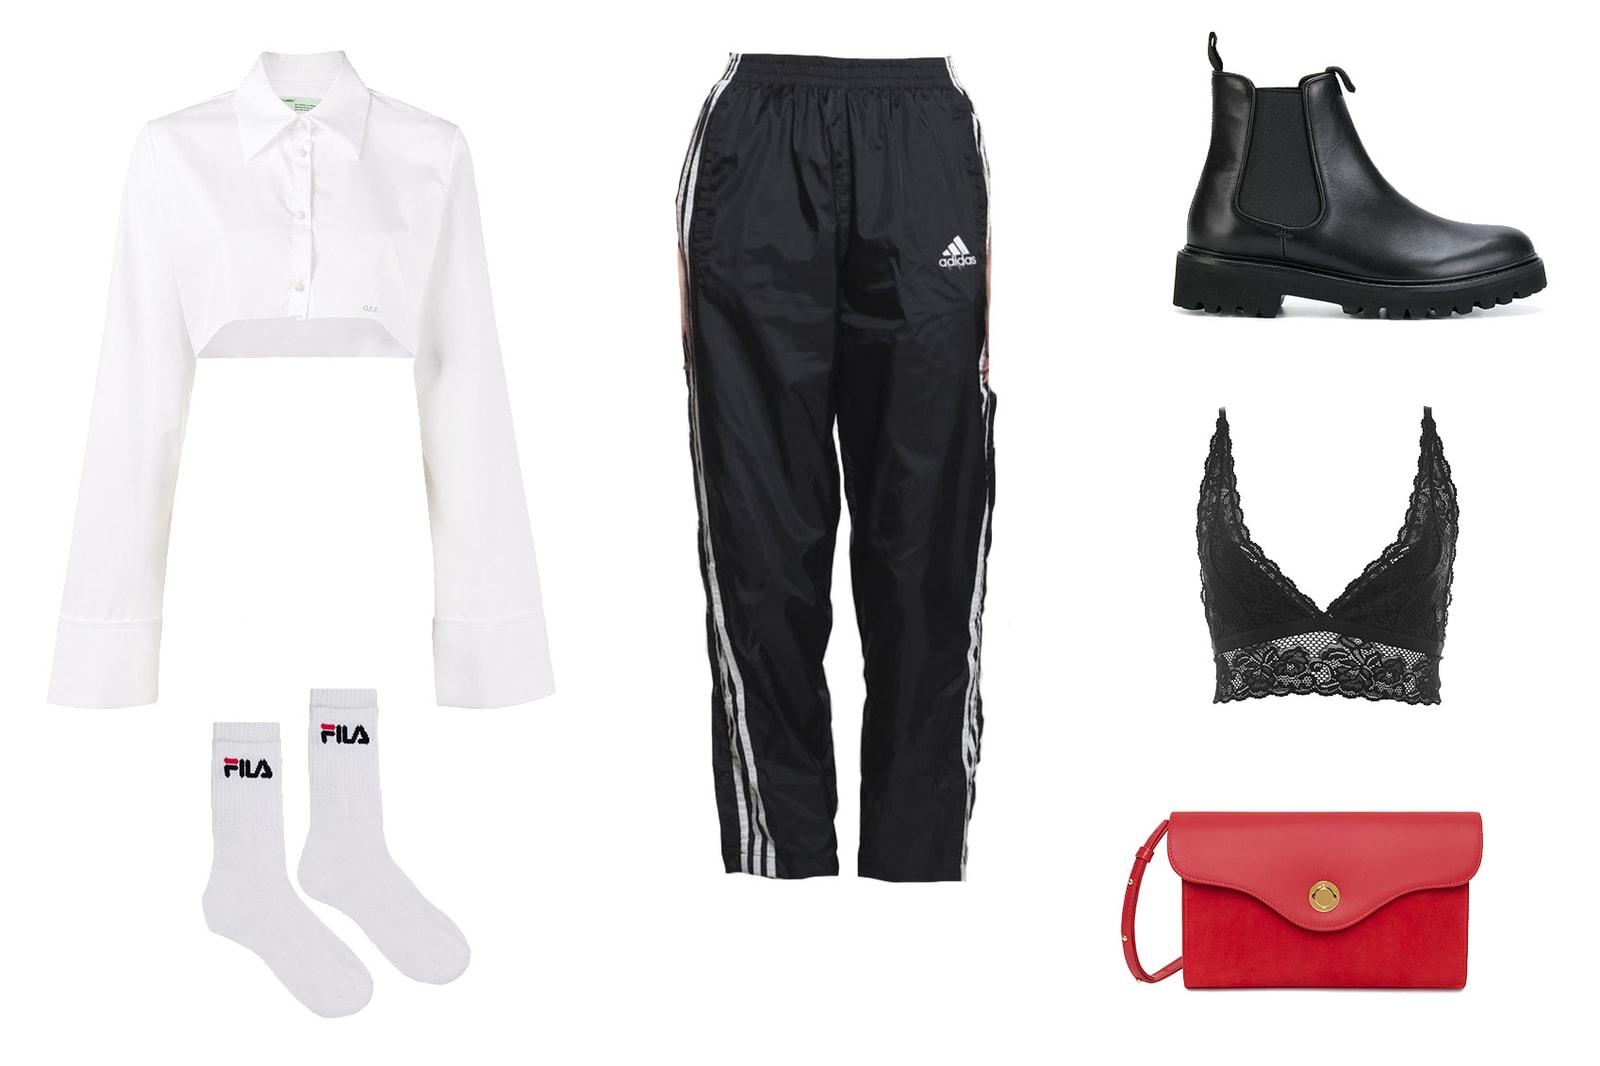 How to Wear Track Pants Vintage Adidas Sporty Retro Button up Black Athleisure Luxury Off-White Mansur Gavriel Nike Fila Kappa